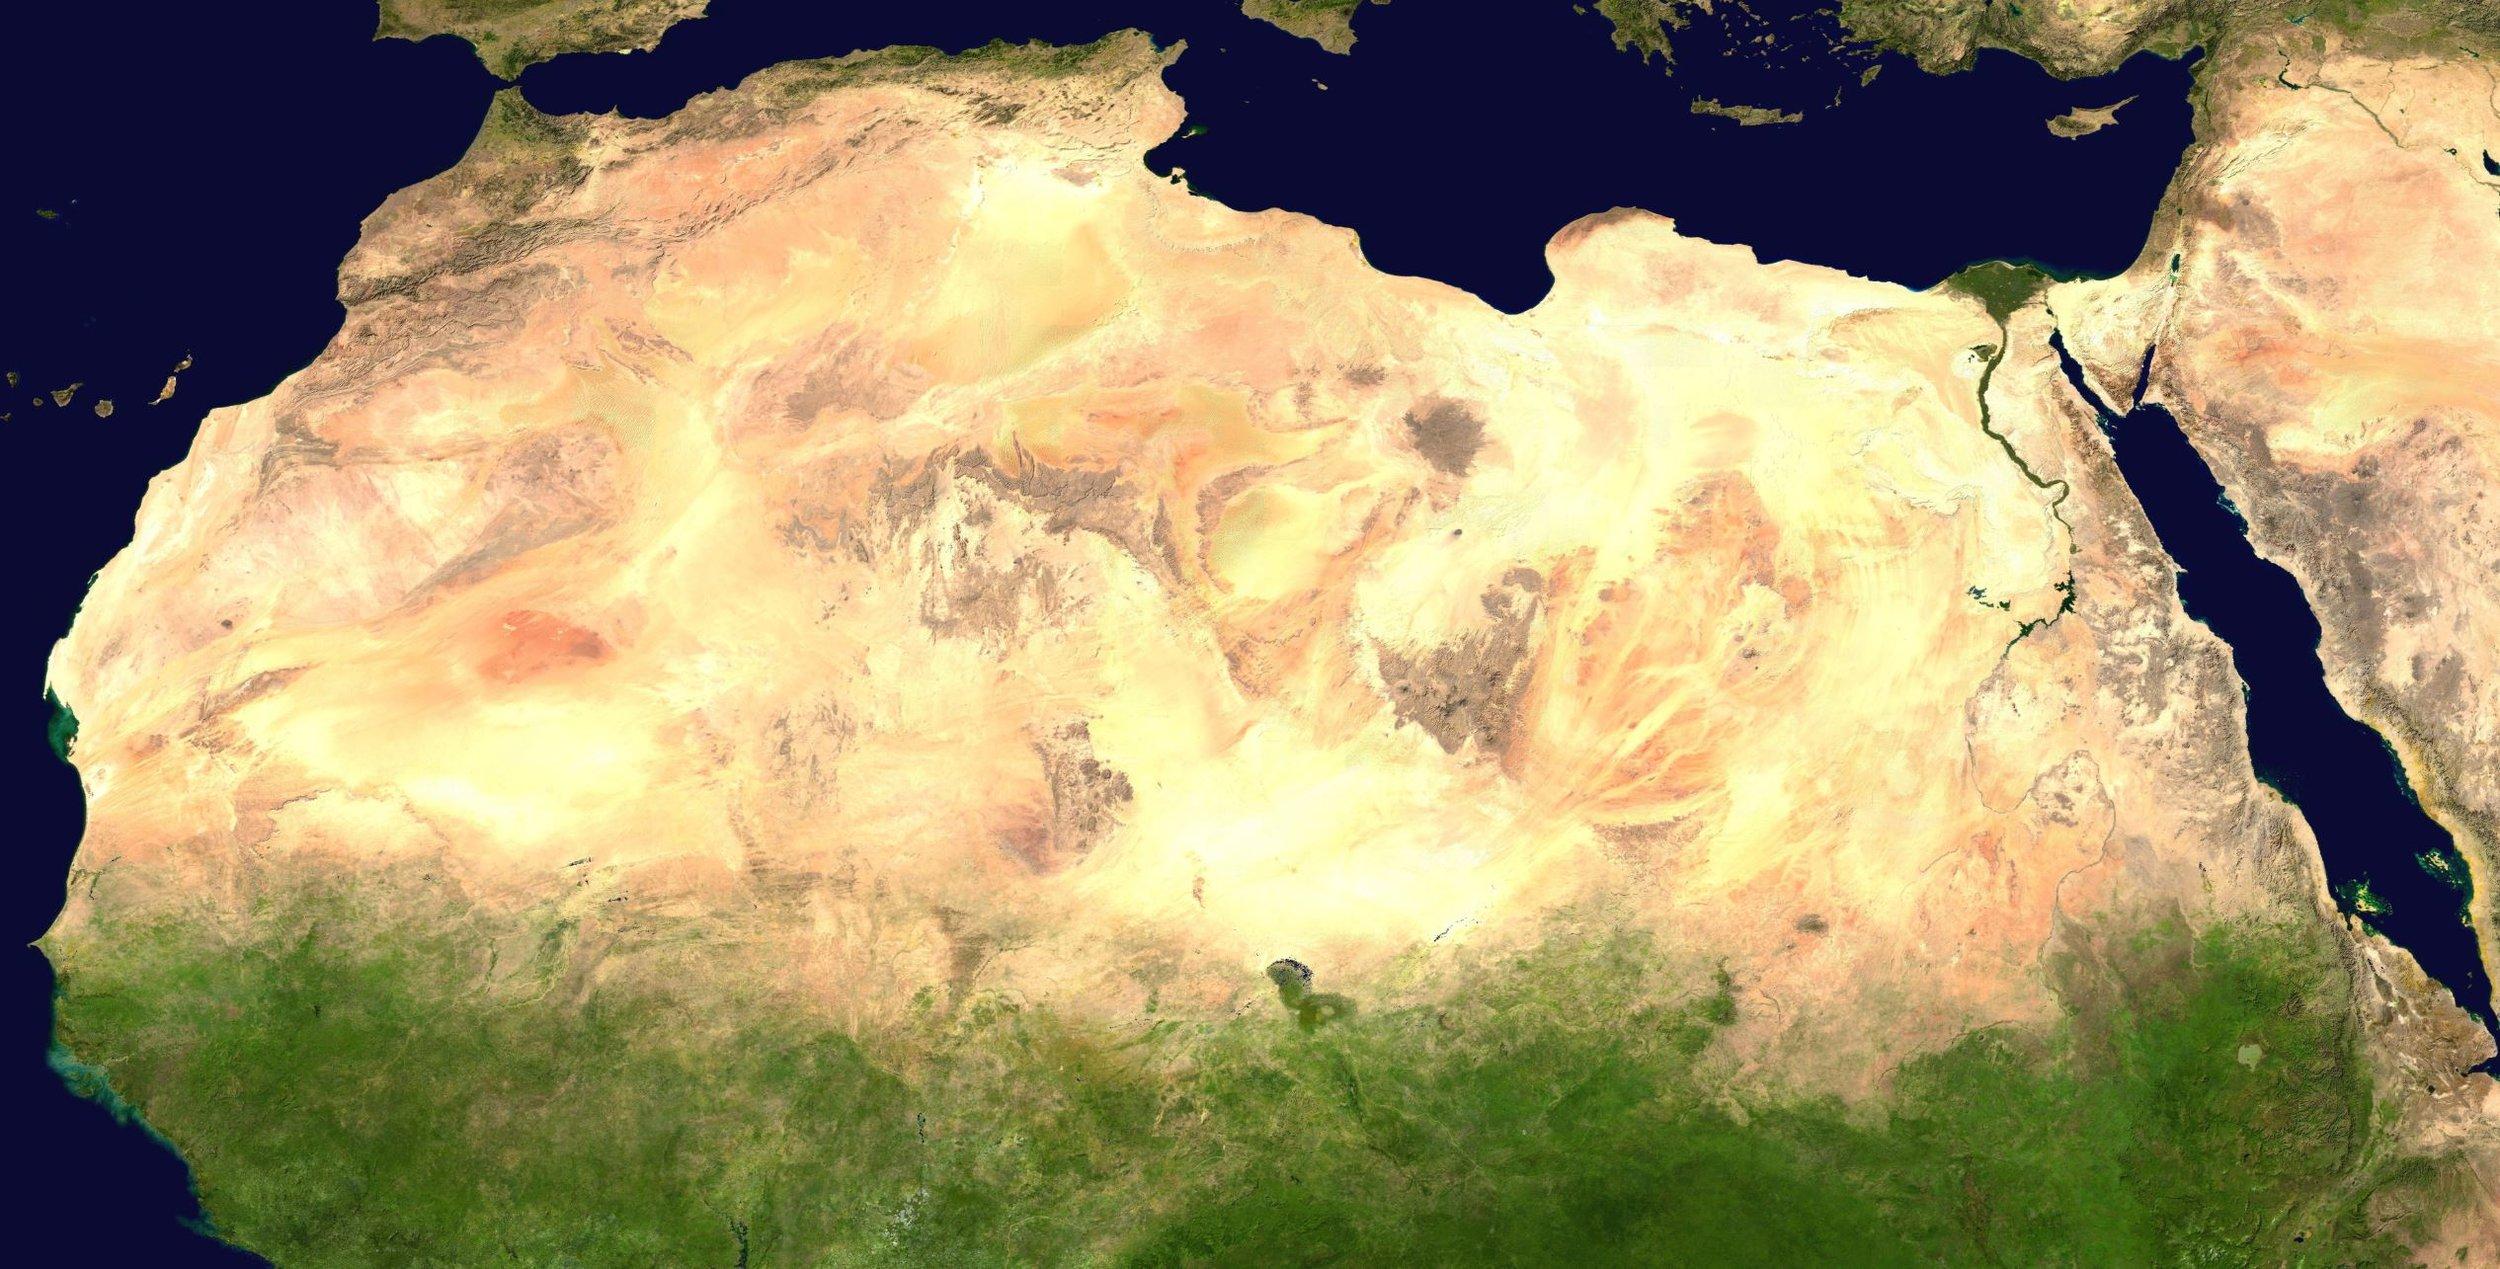 Image Credit:  NASA via Wikimedia Commons